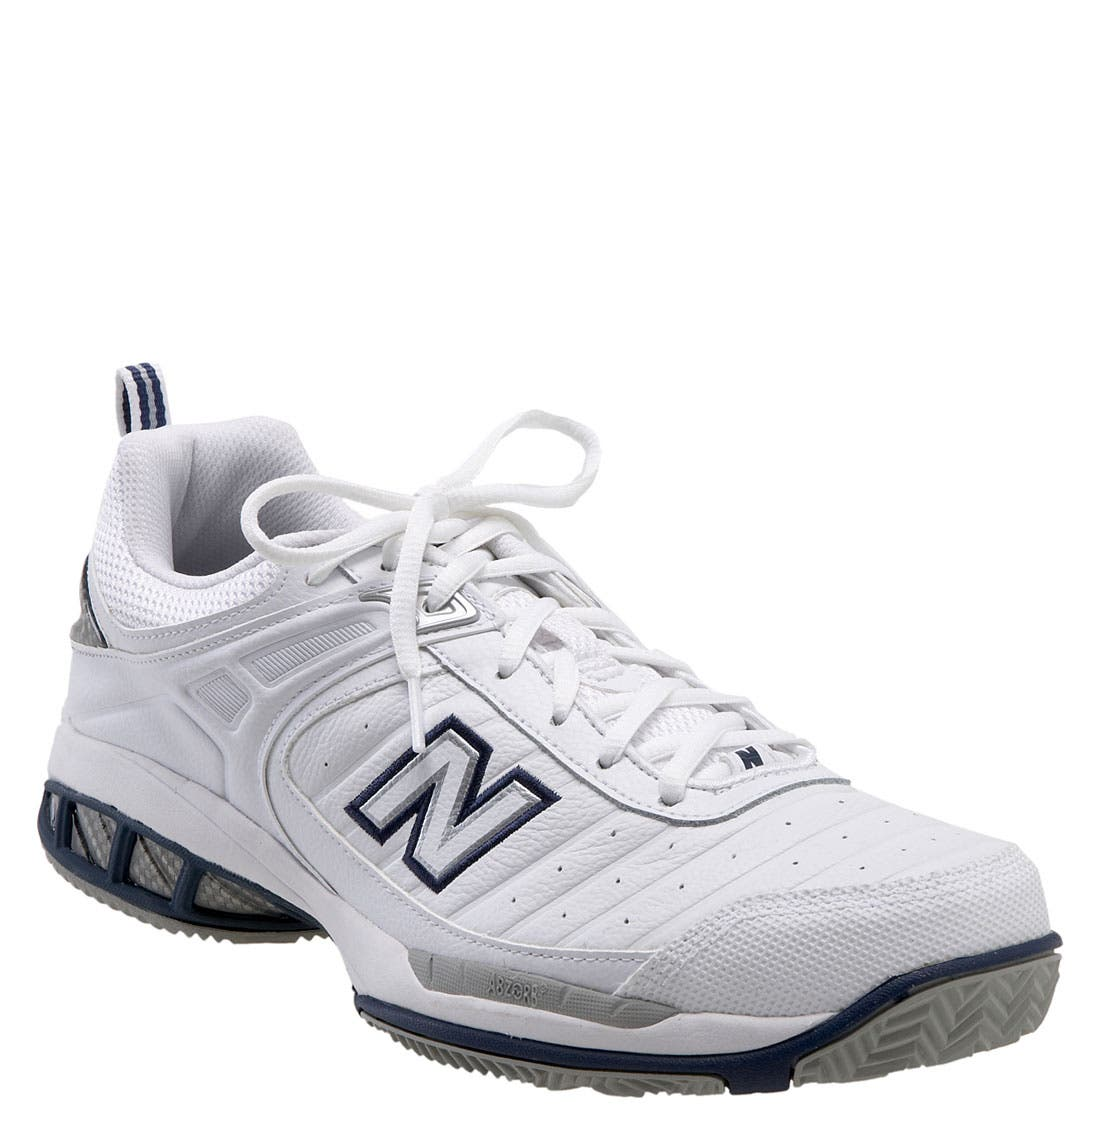 Main Image - New Balance '804' Tennis Shoe (Men)